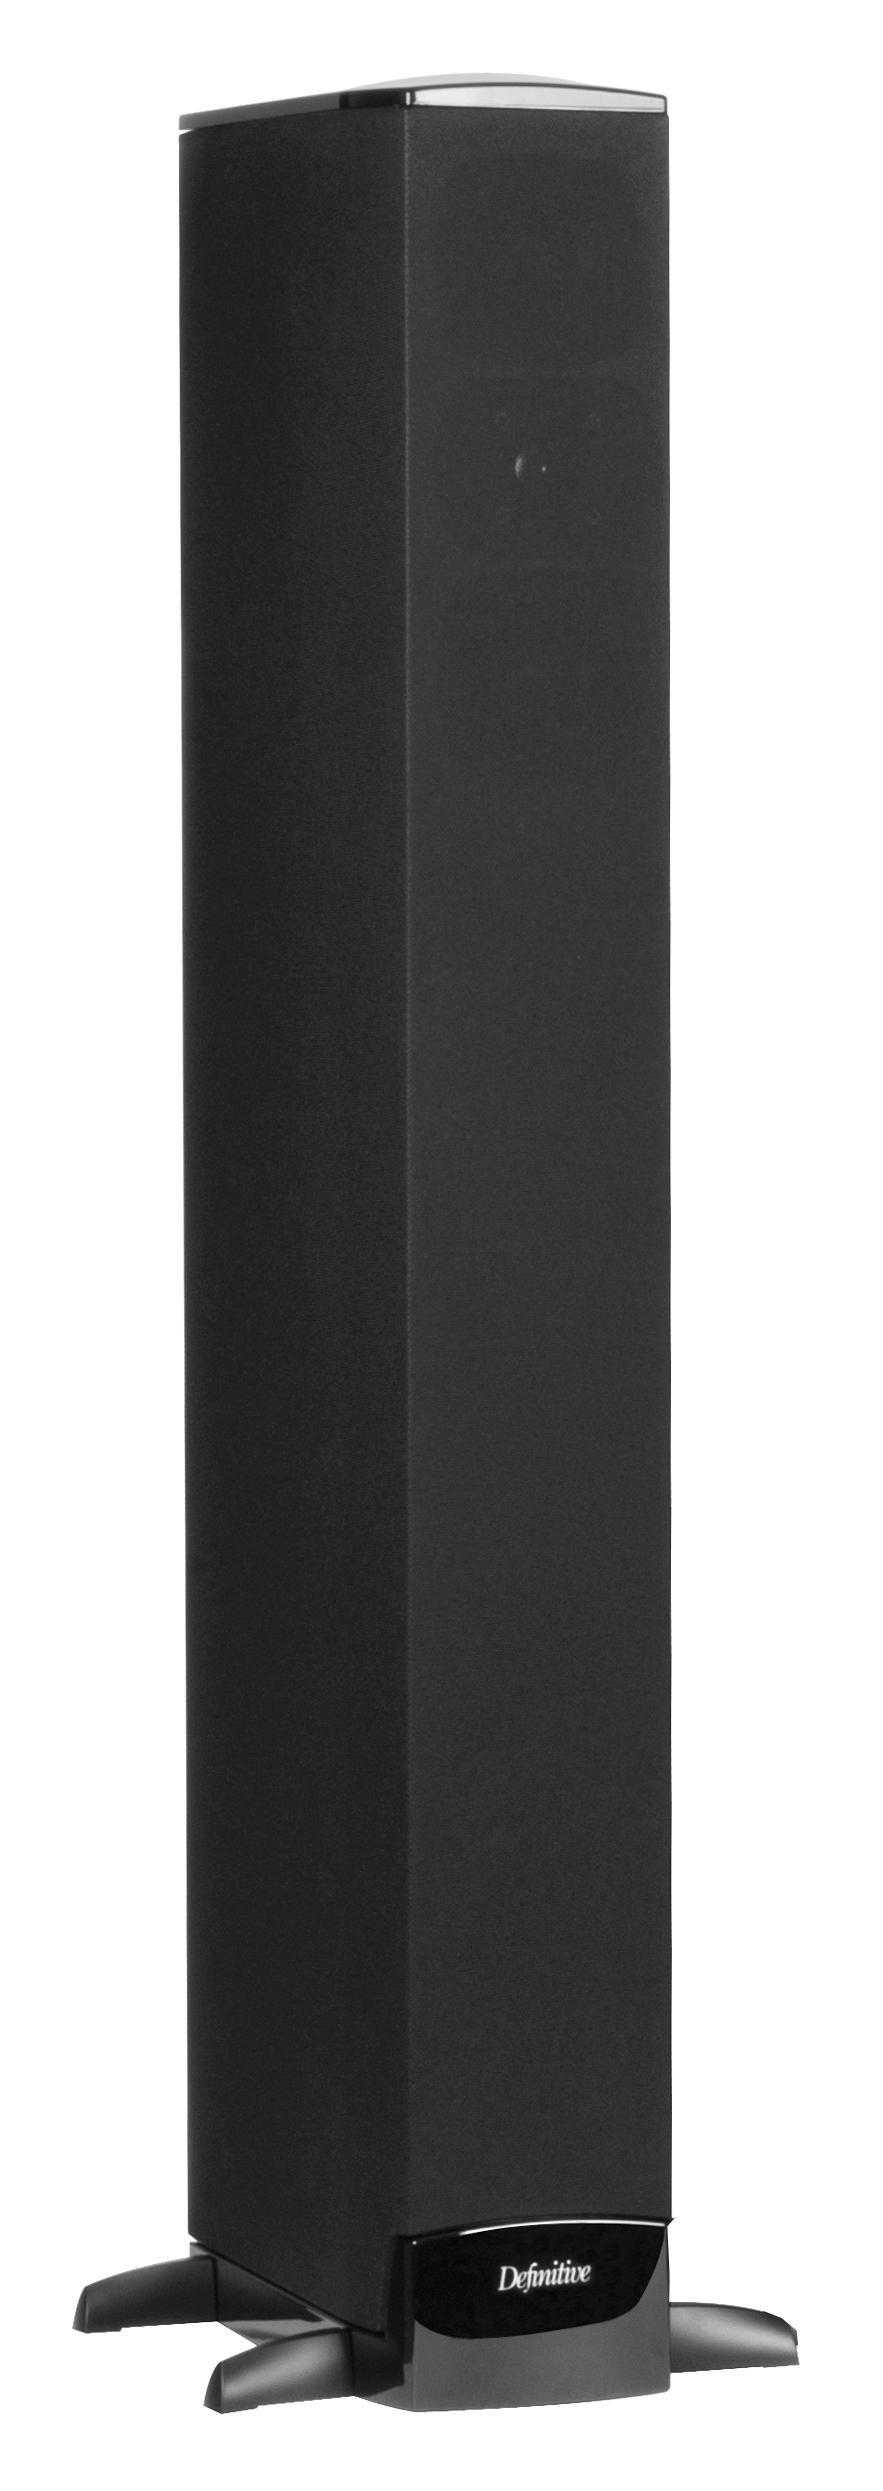 Definitive Technology BiPolar Series 300 Watt Bipolar SuperTower - Item Number: BP-8040ST